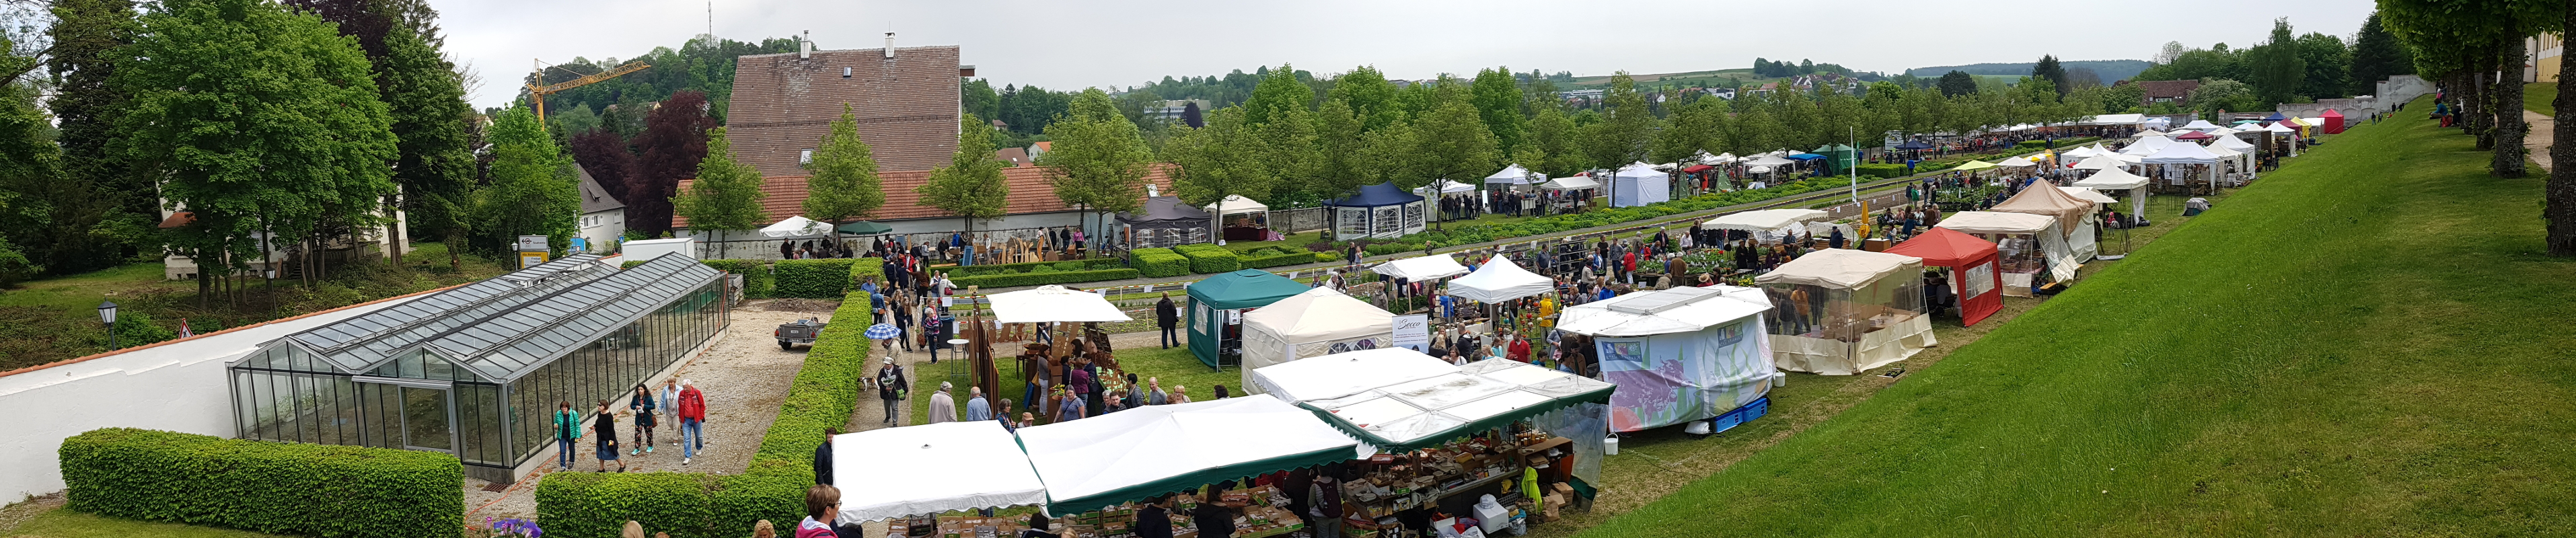 Kräuterfest im Konventgarten des Klosters Ochsenhausen